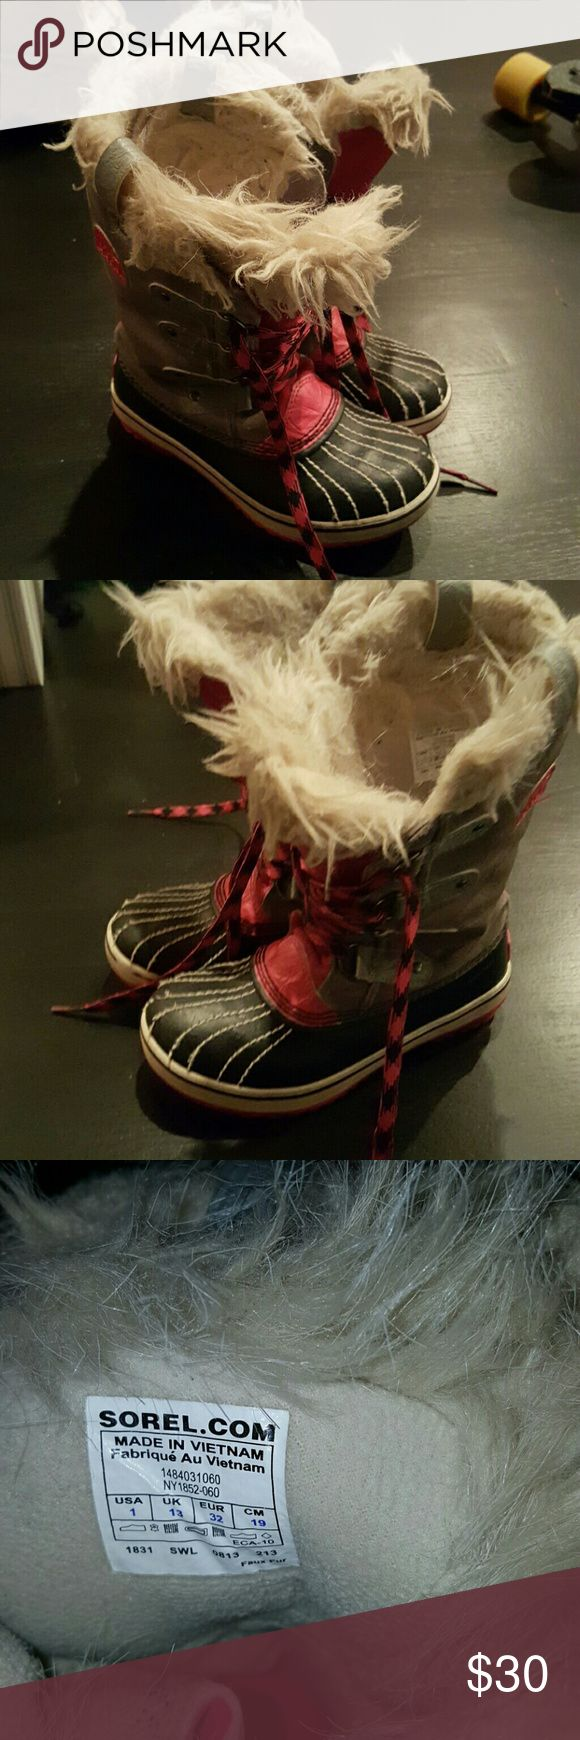 Kids Sorel boots size 1 usa Sorel pink and blue sorels Mango Shoes Winter & Rain Boots